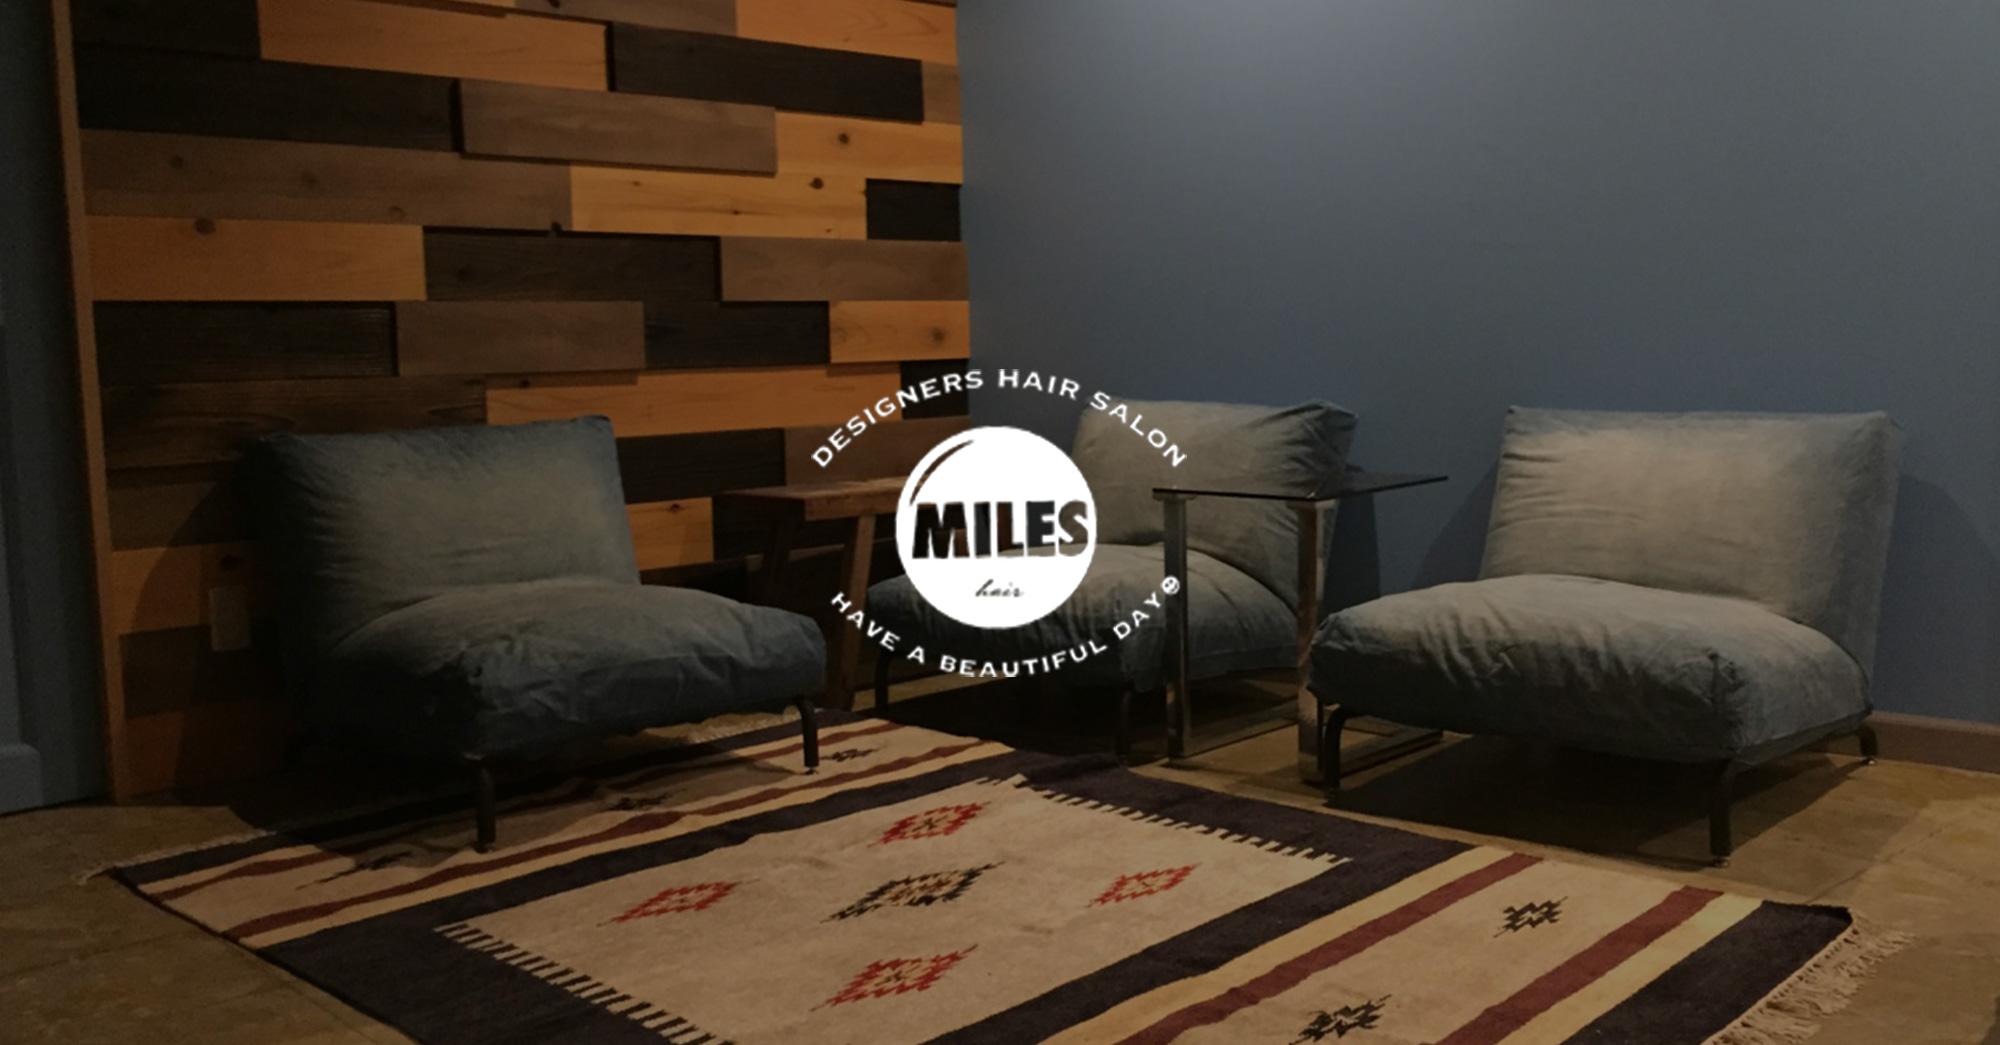 h_mlies_detail